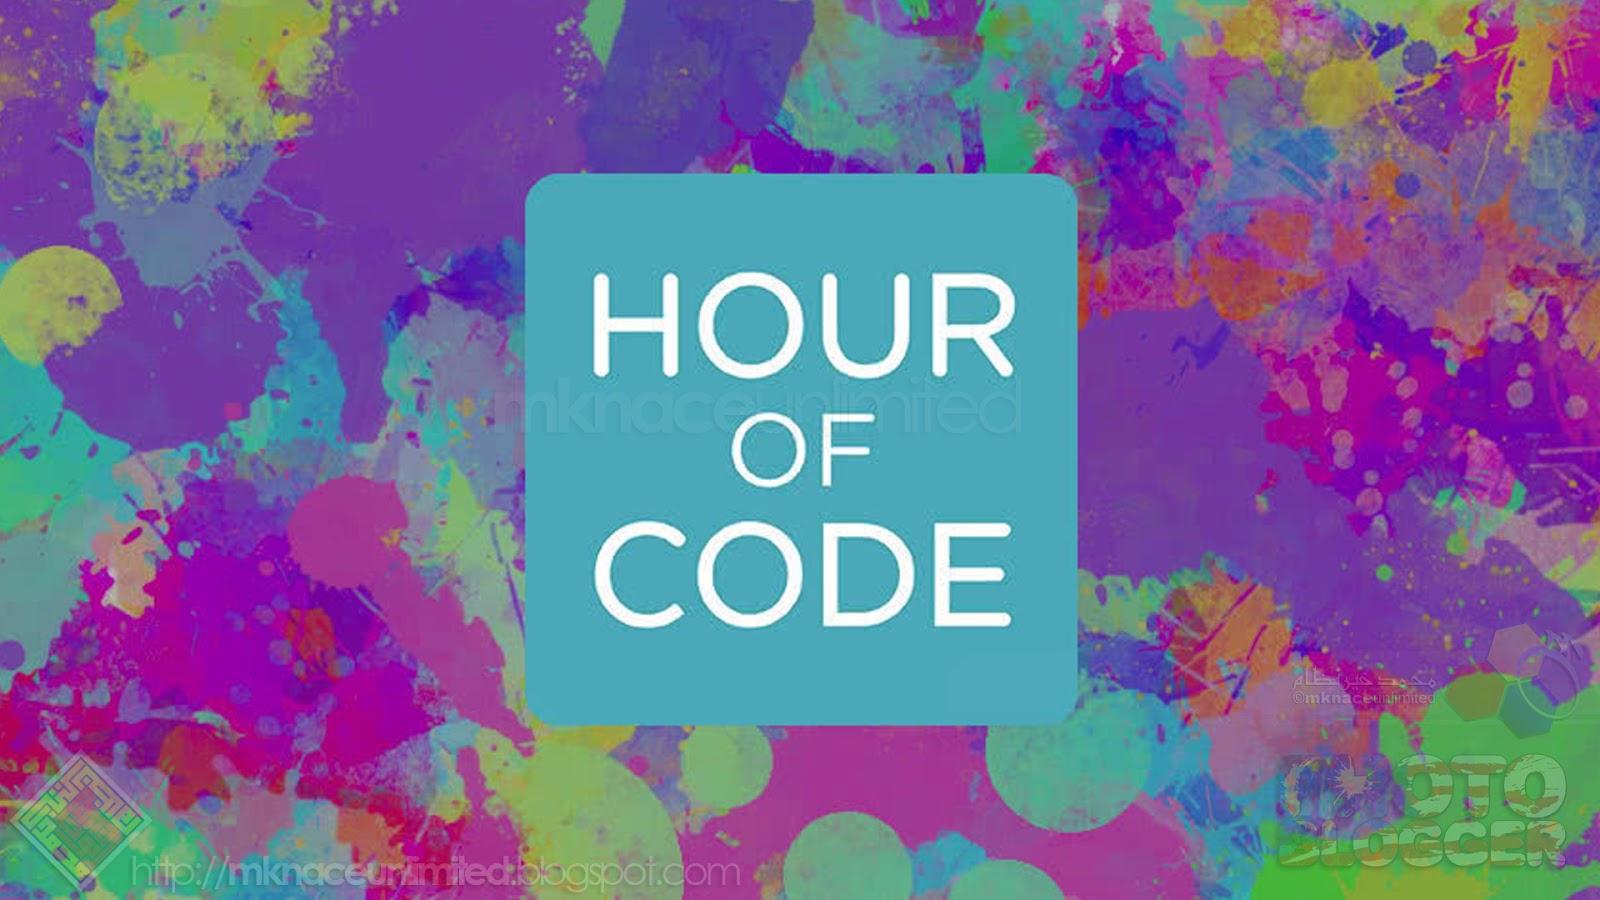 Acara Hour of Code bermula sebagai pengenalan kepada Sains Komputer yang  disampaikan dalam masa satu jam c3ee7f0402